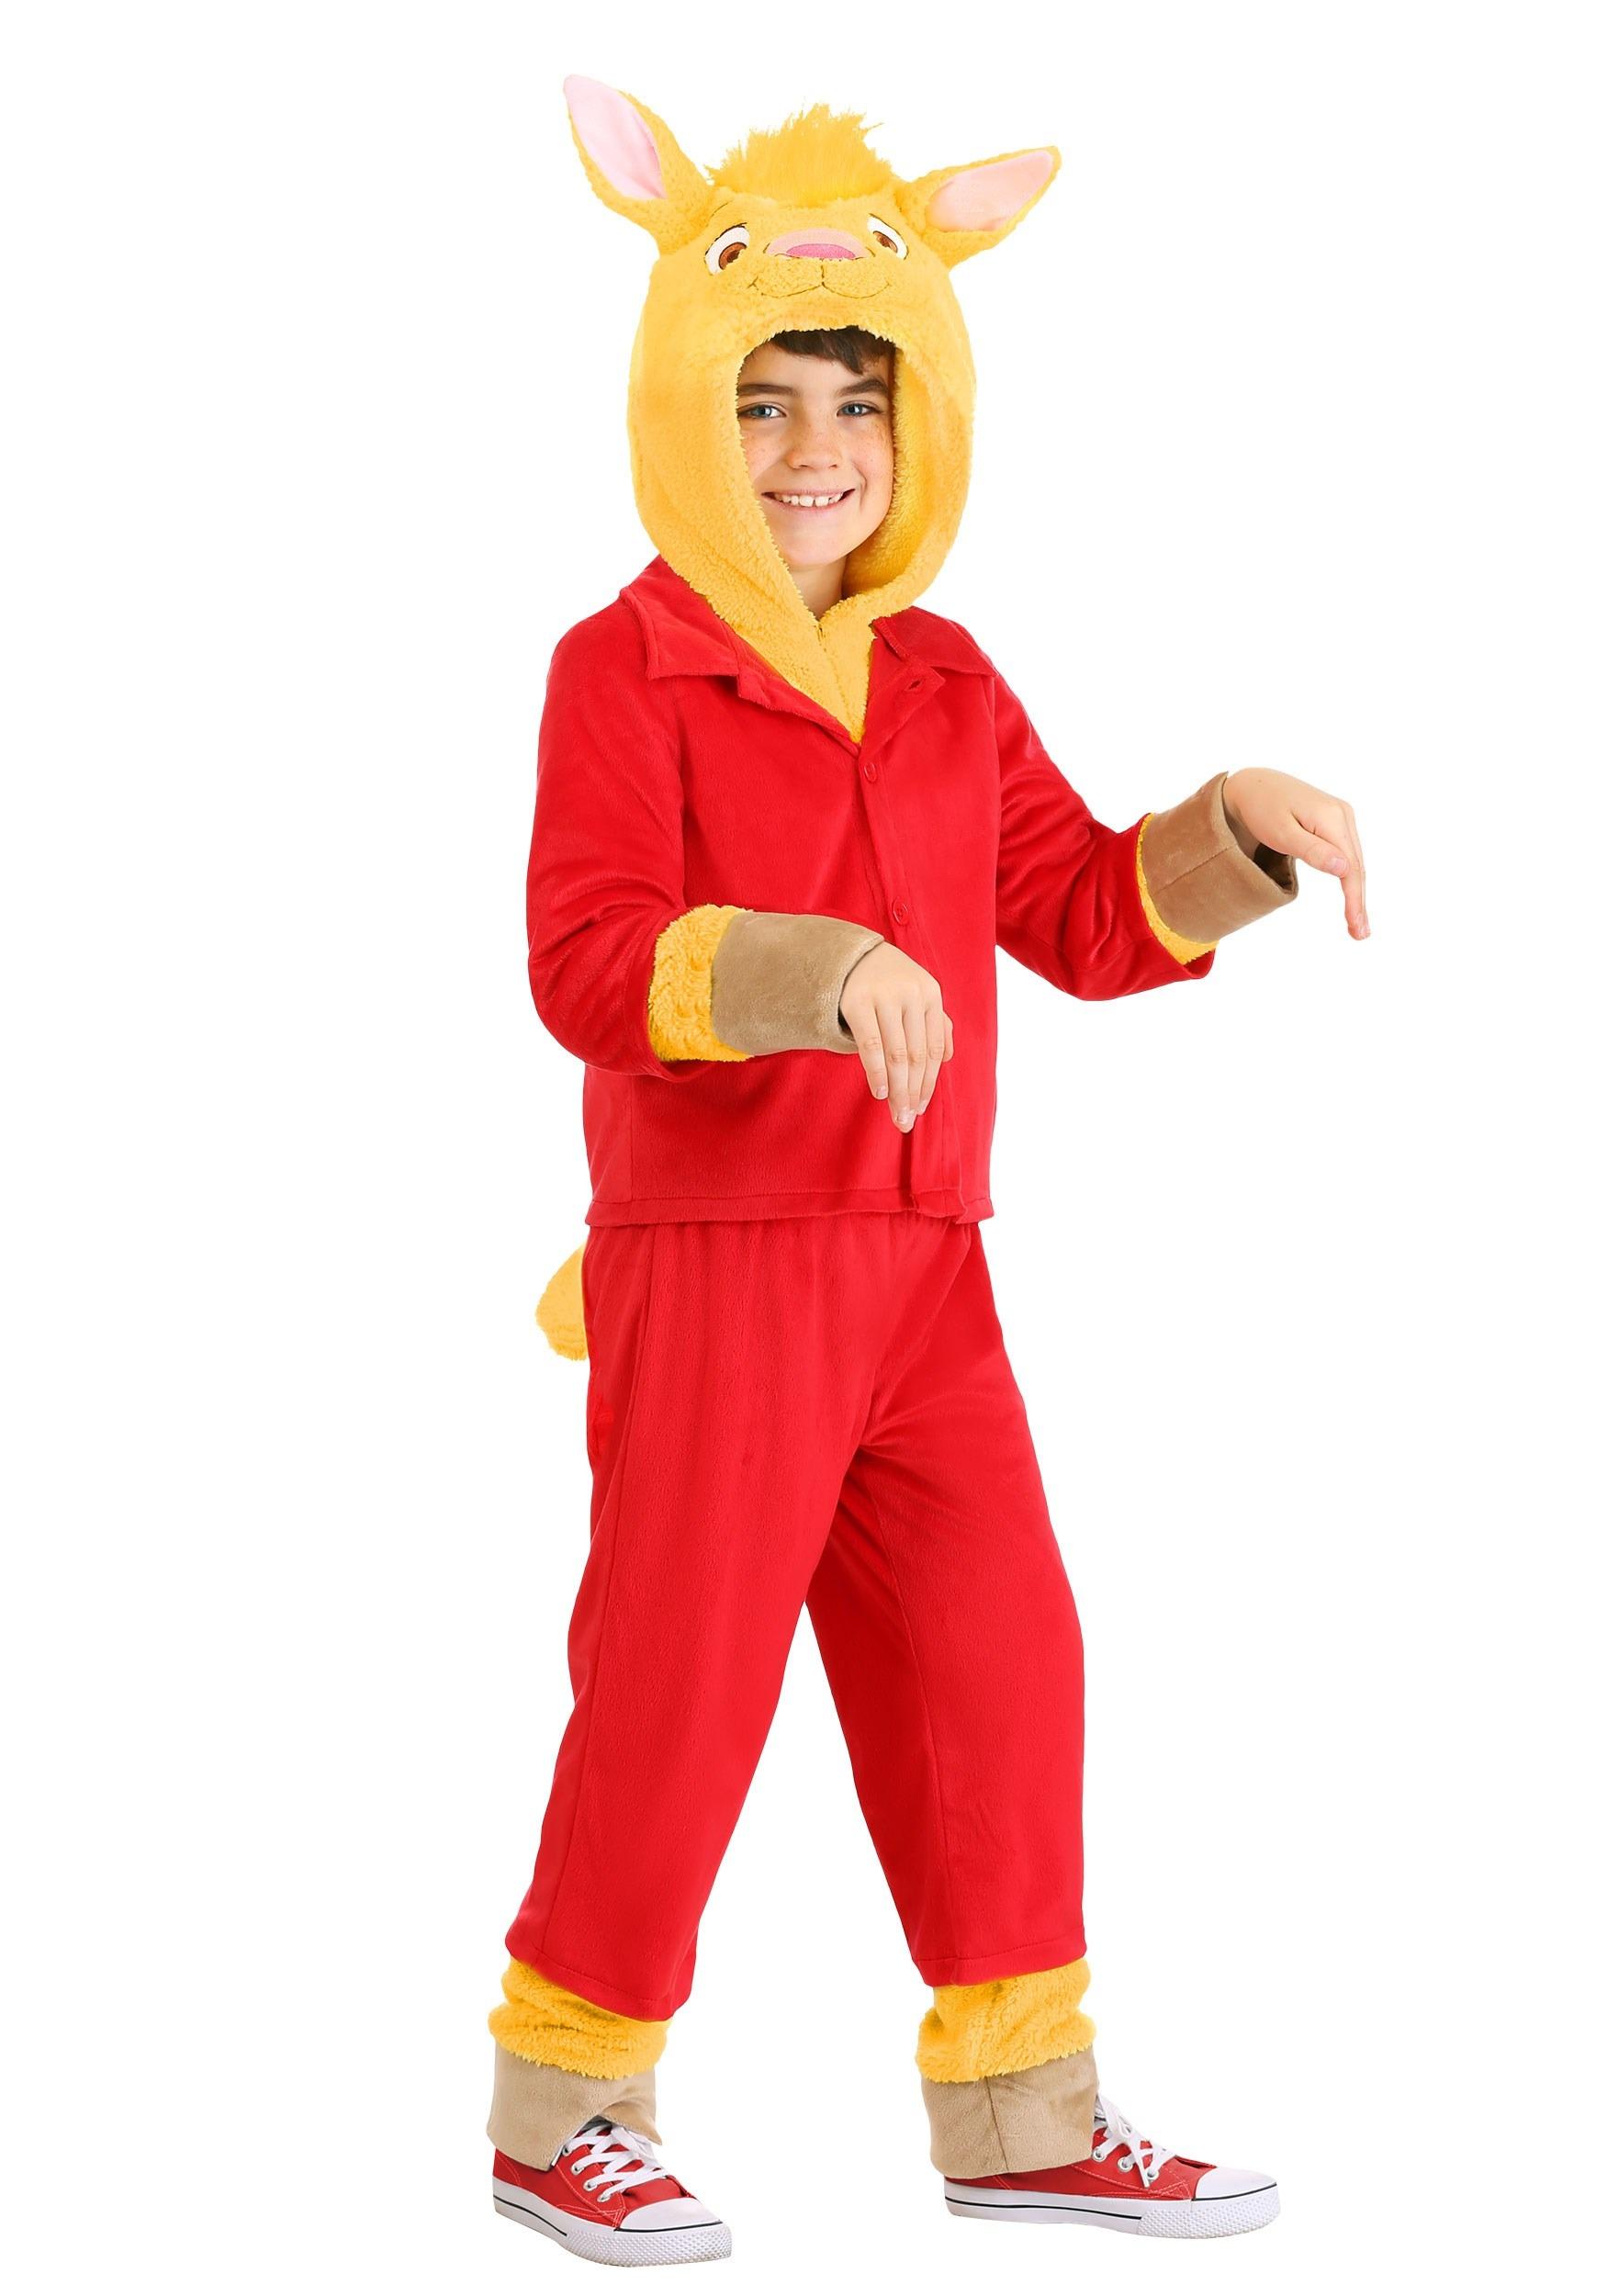 Llama Llama Red Pajama Kids Costume